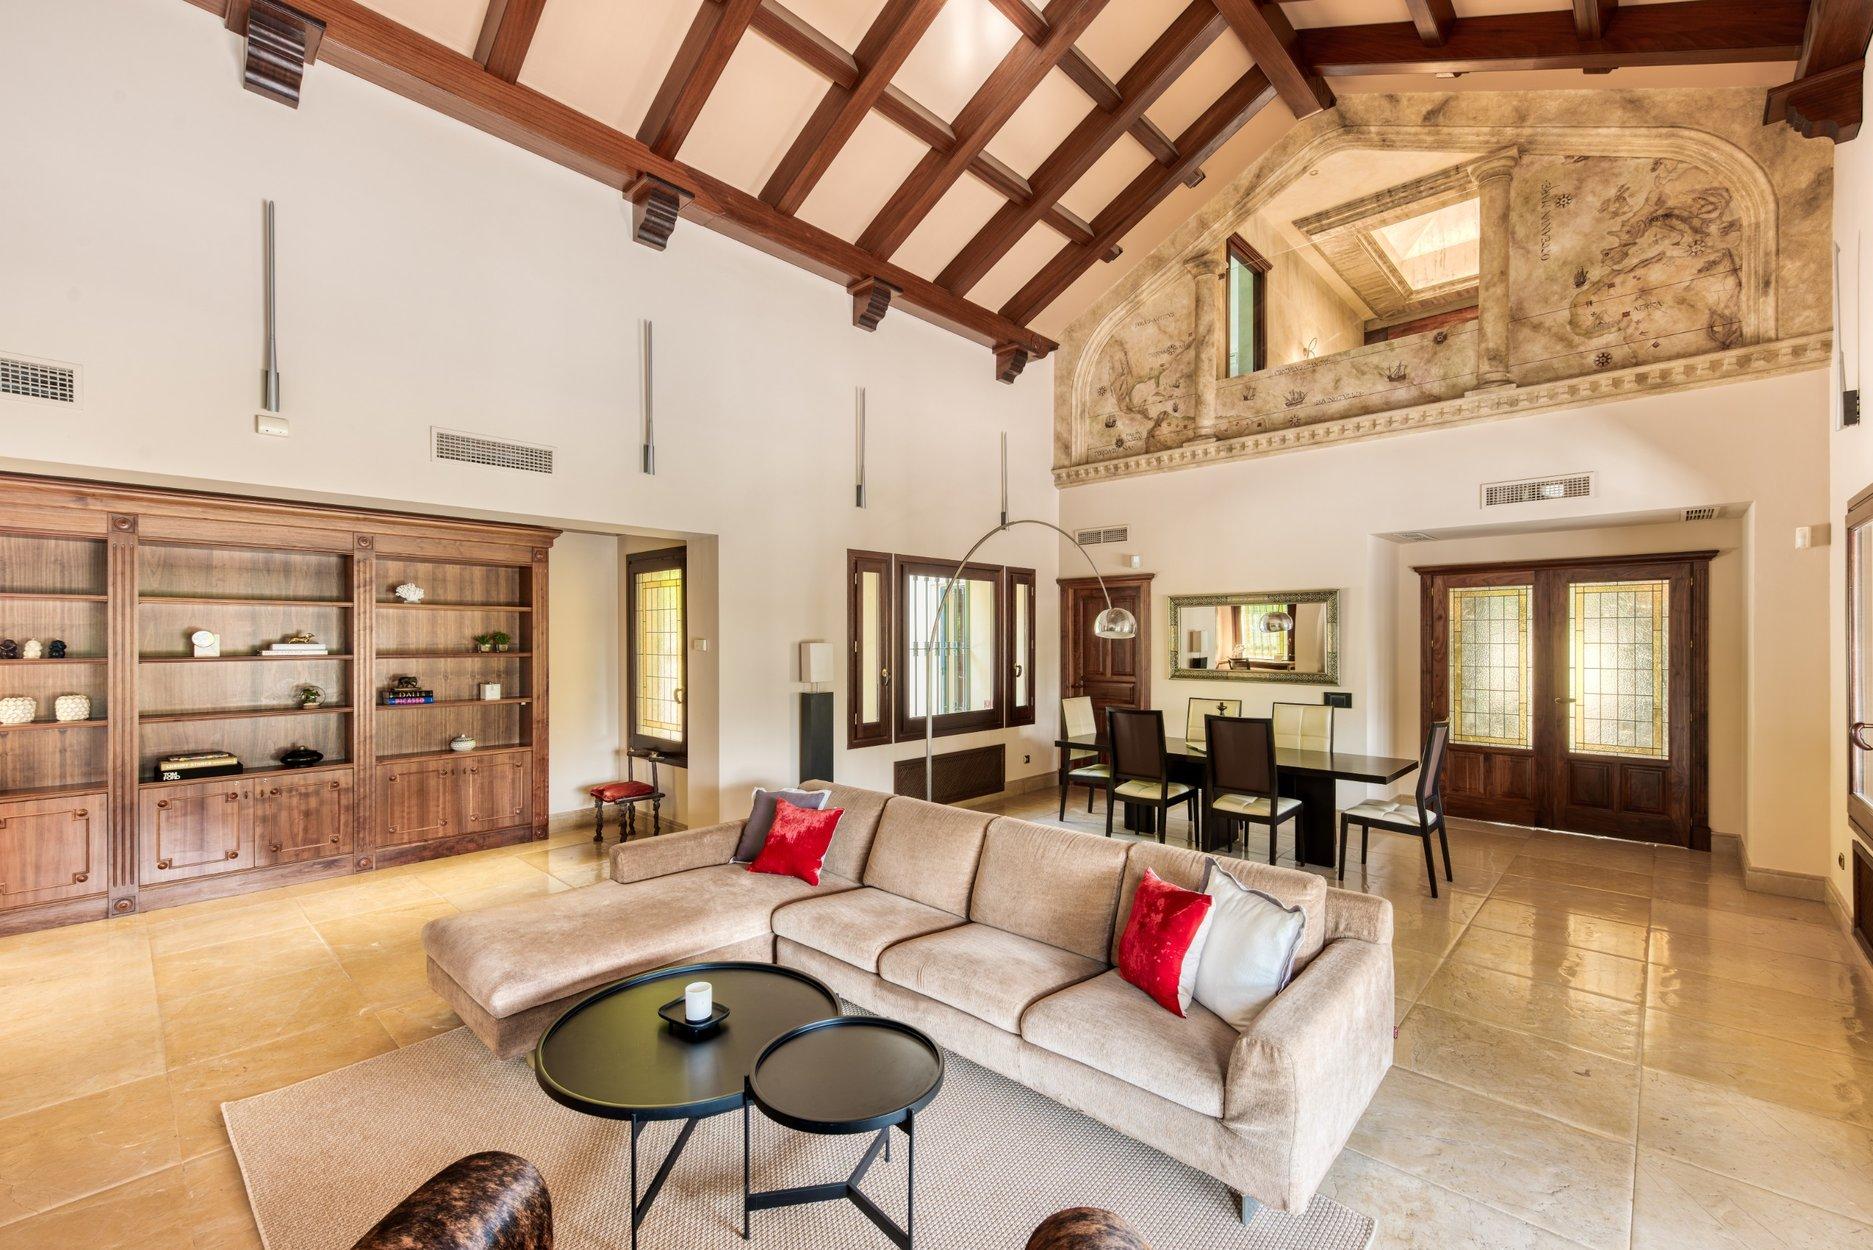 aaa4 bedroom Villa in Sierra Blanca, Marbella | M287793